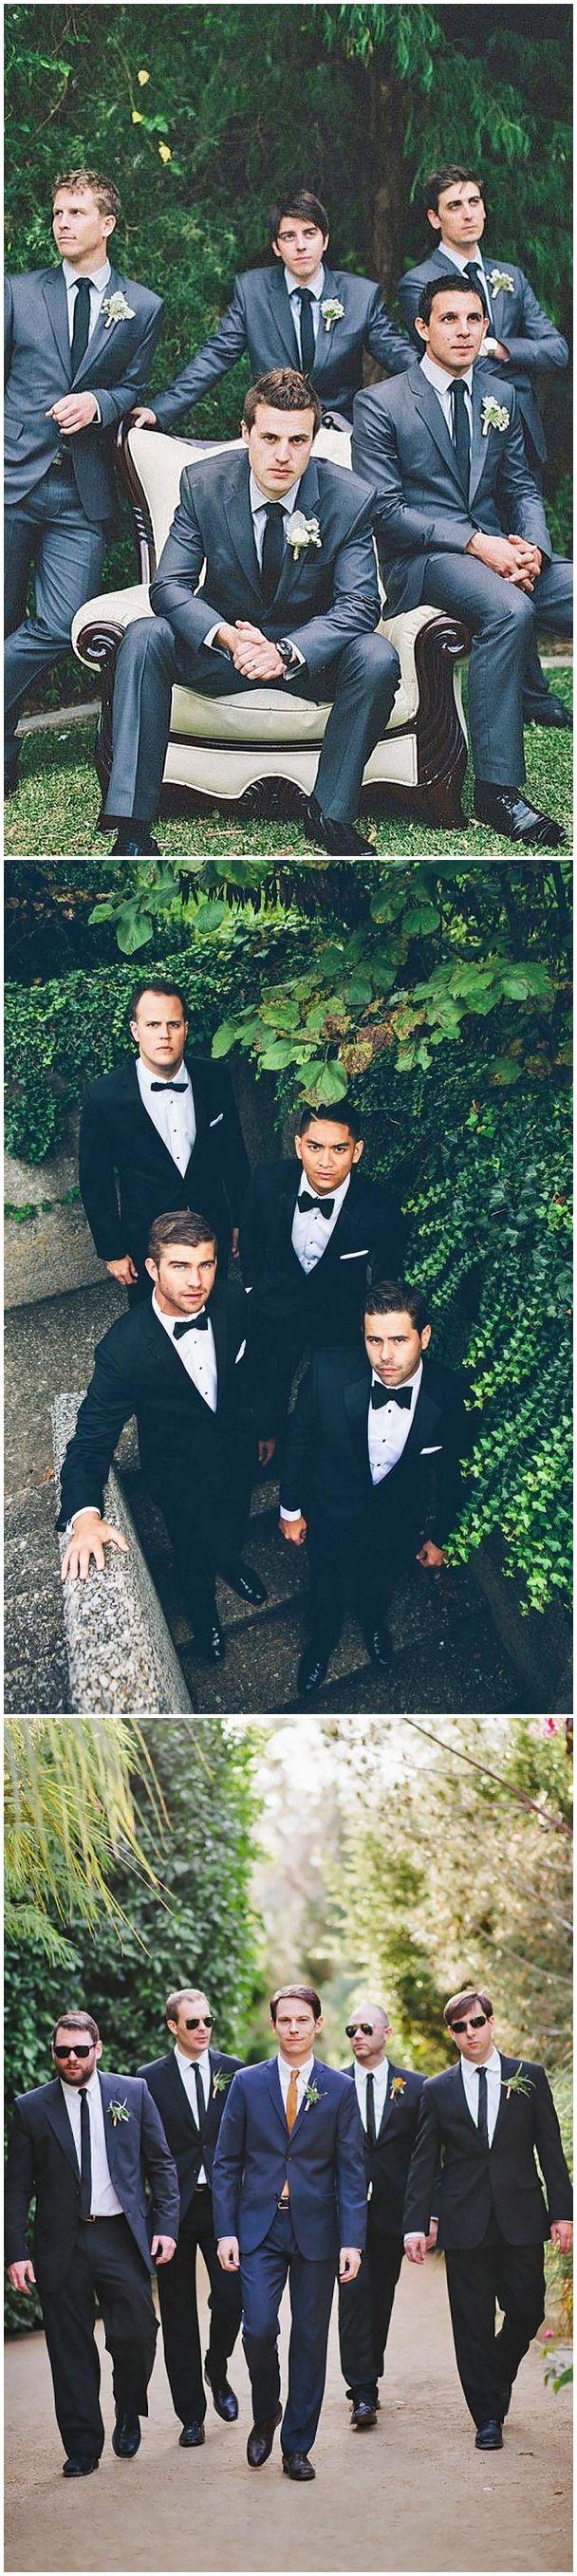 Creative Wedding Poses for Groomsmen /   http://www.himisspuff.com/groomsmen-wedding-photo-ideas/